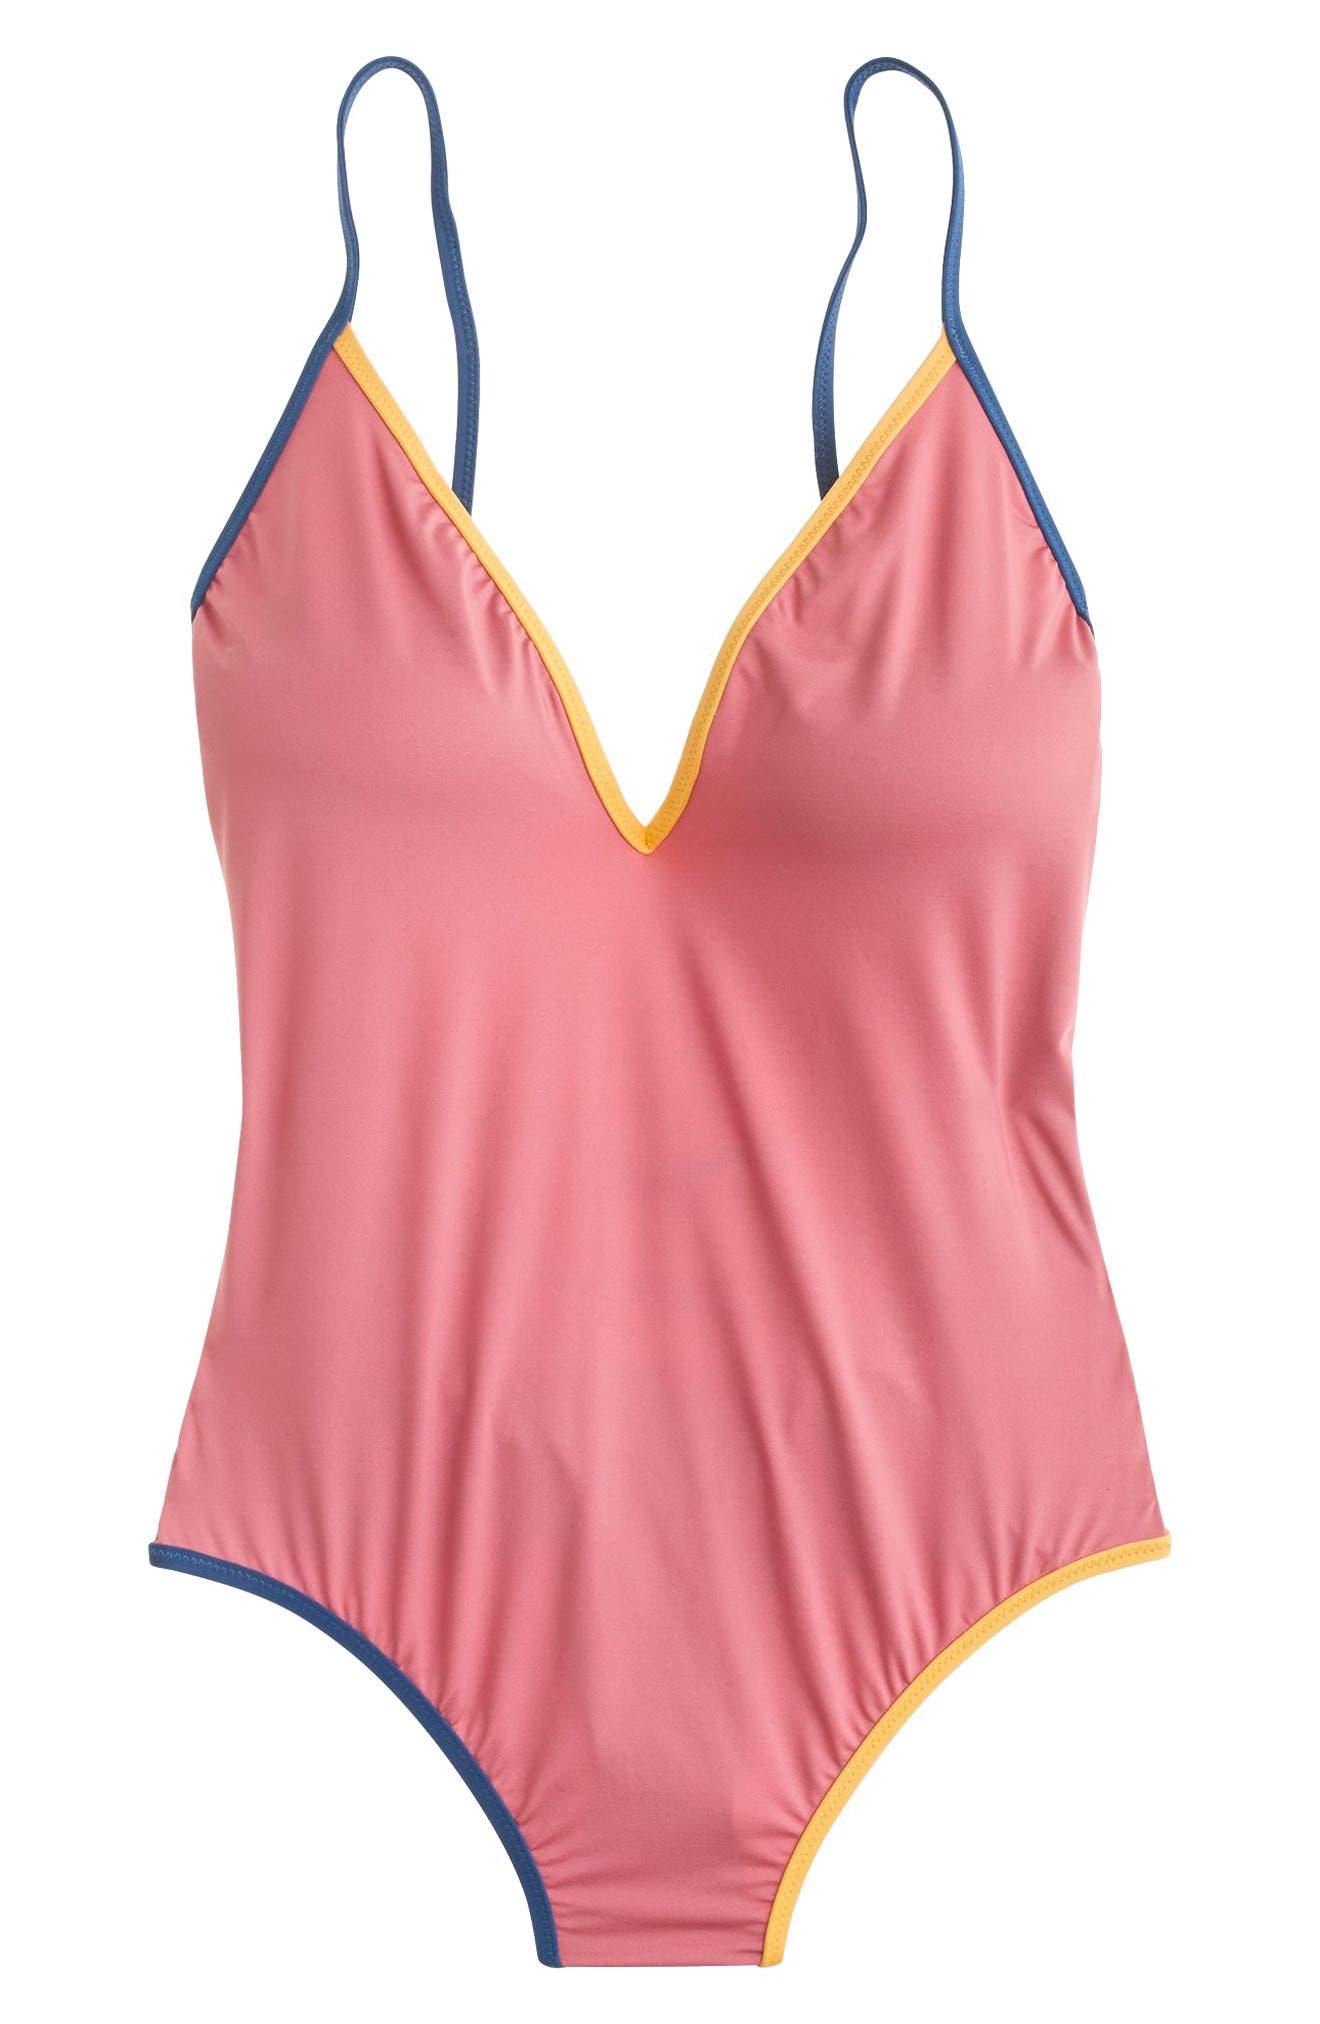 Playa Montauk Strappy One-Piece Swimsuit,                             Alternate thumbnail 6, color,                             Vintage Pink Multi